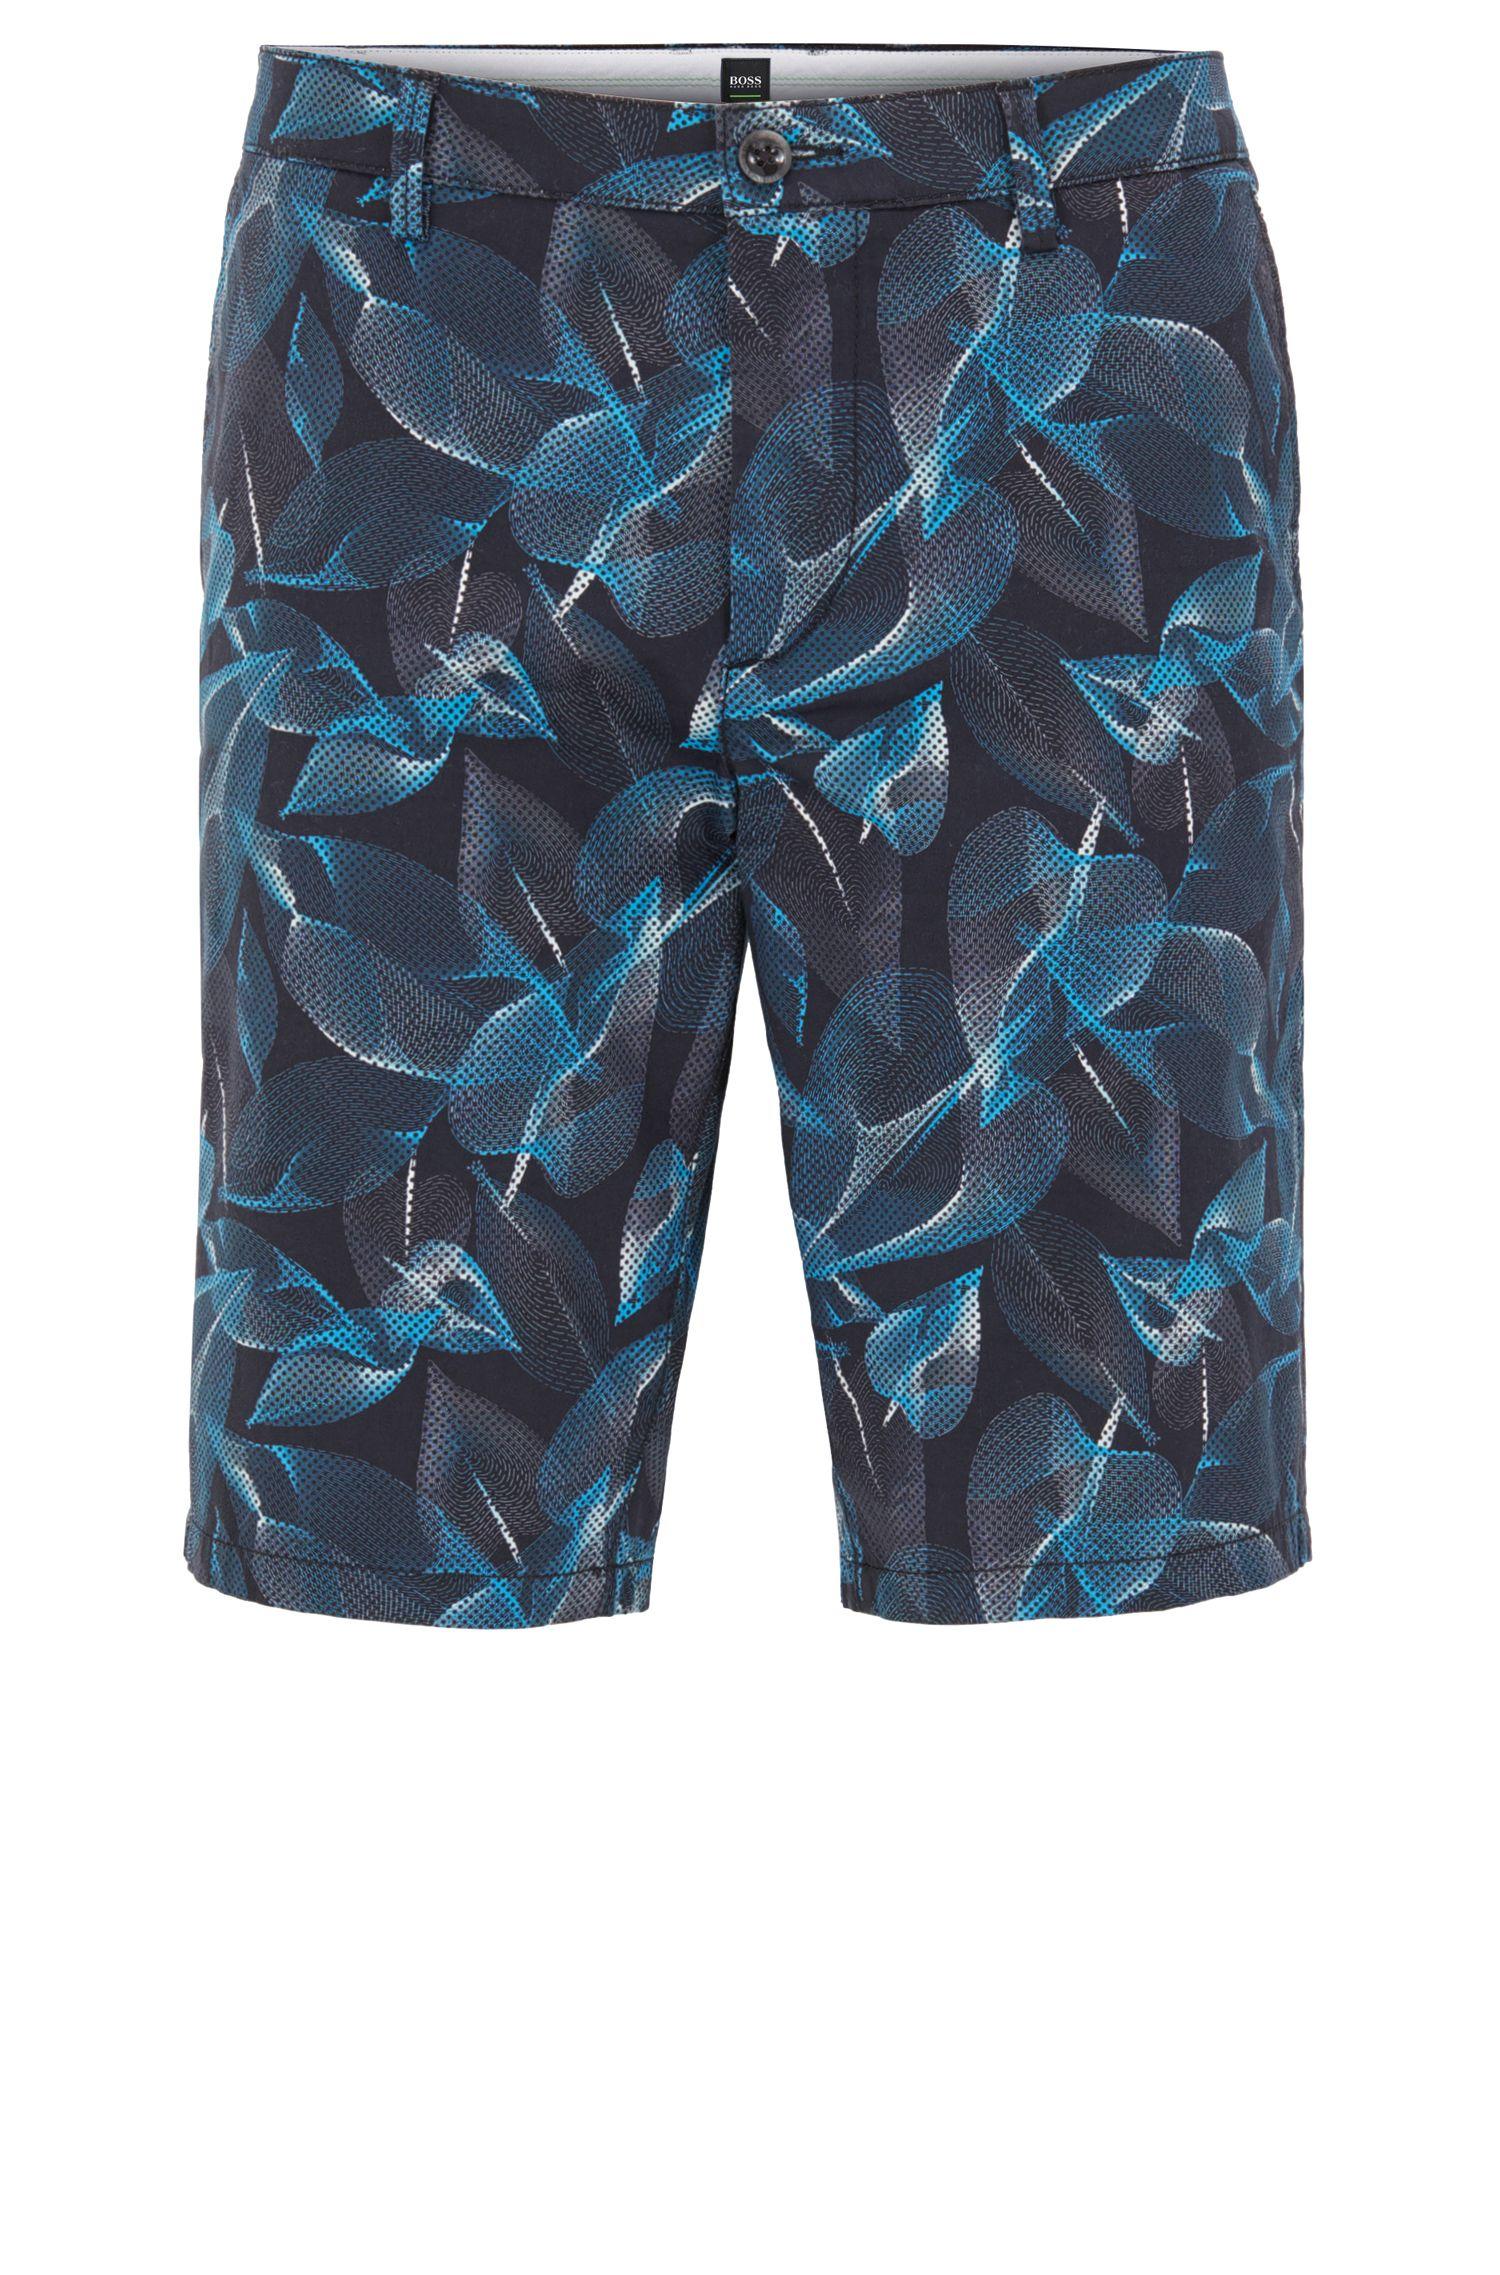 Printed Sateen Stretch Cotton Short, Slim Fit | Liem Print W, Open Blue